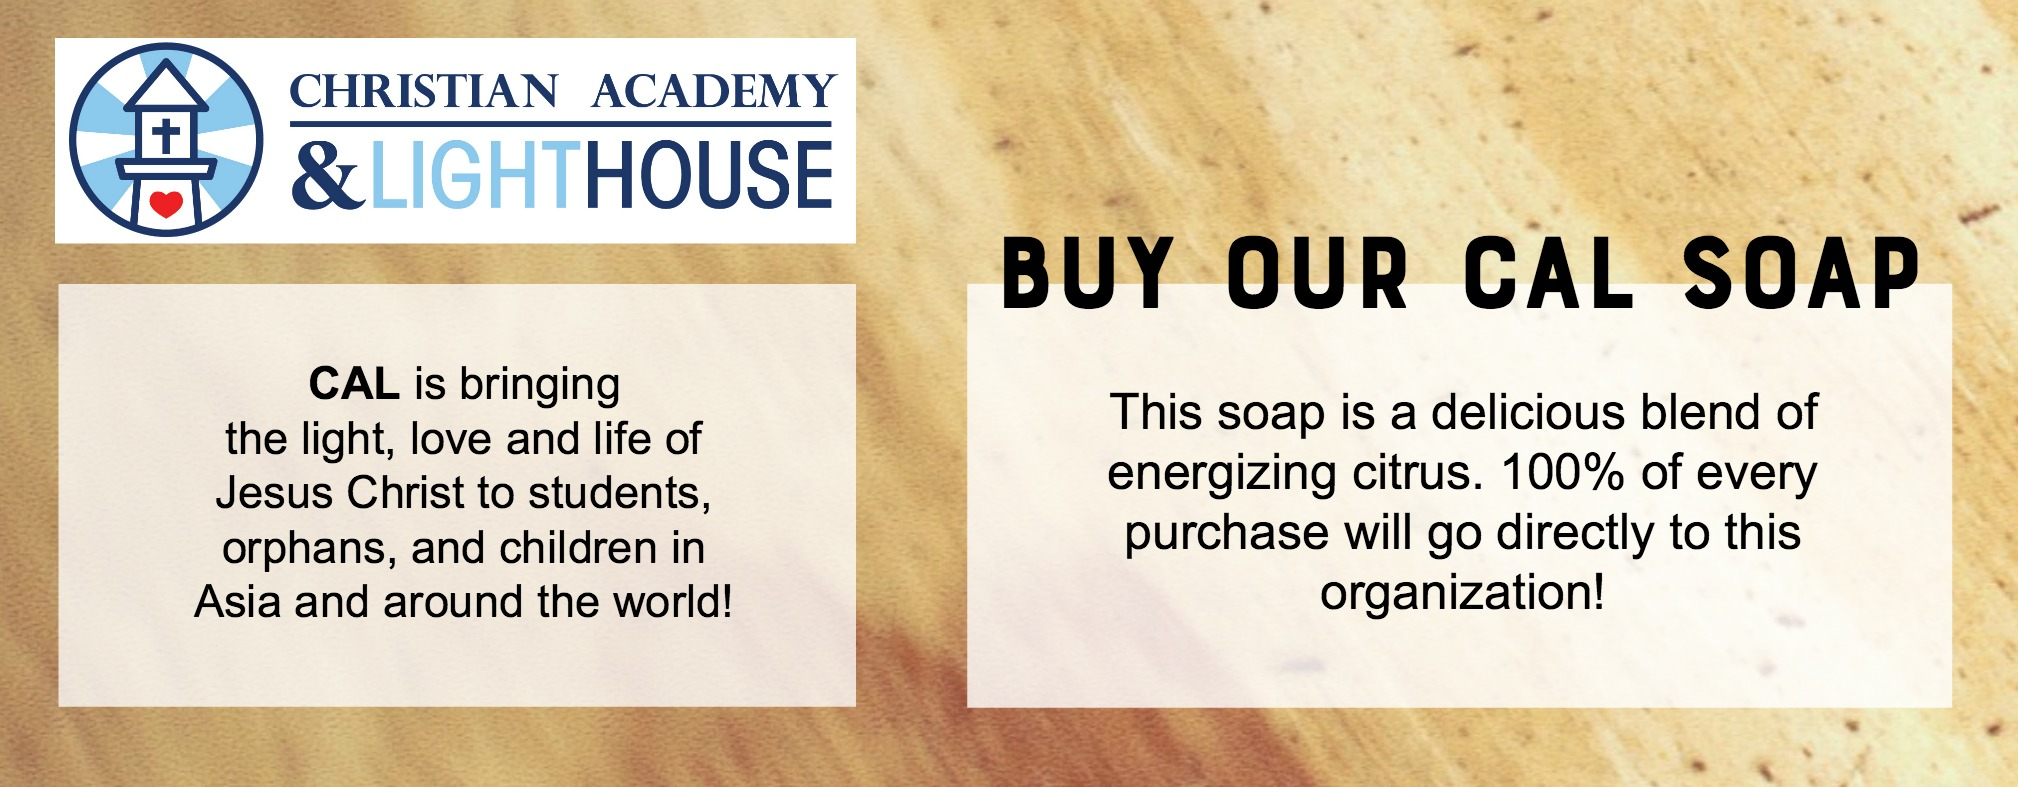 Buy CAL SOAP .jpg